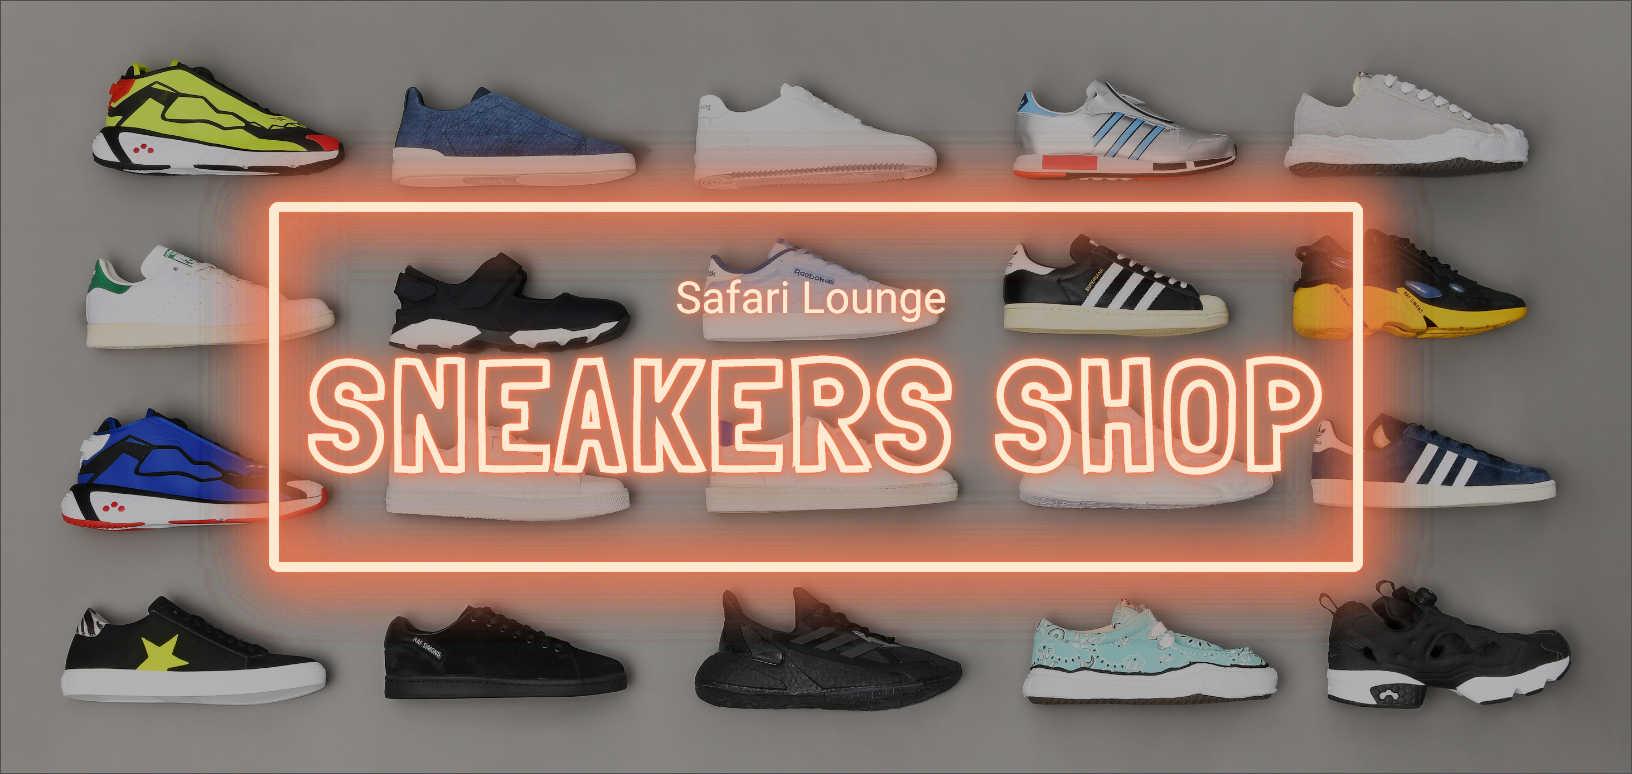 Safari Lounge SNEAKERS SHOP